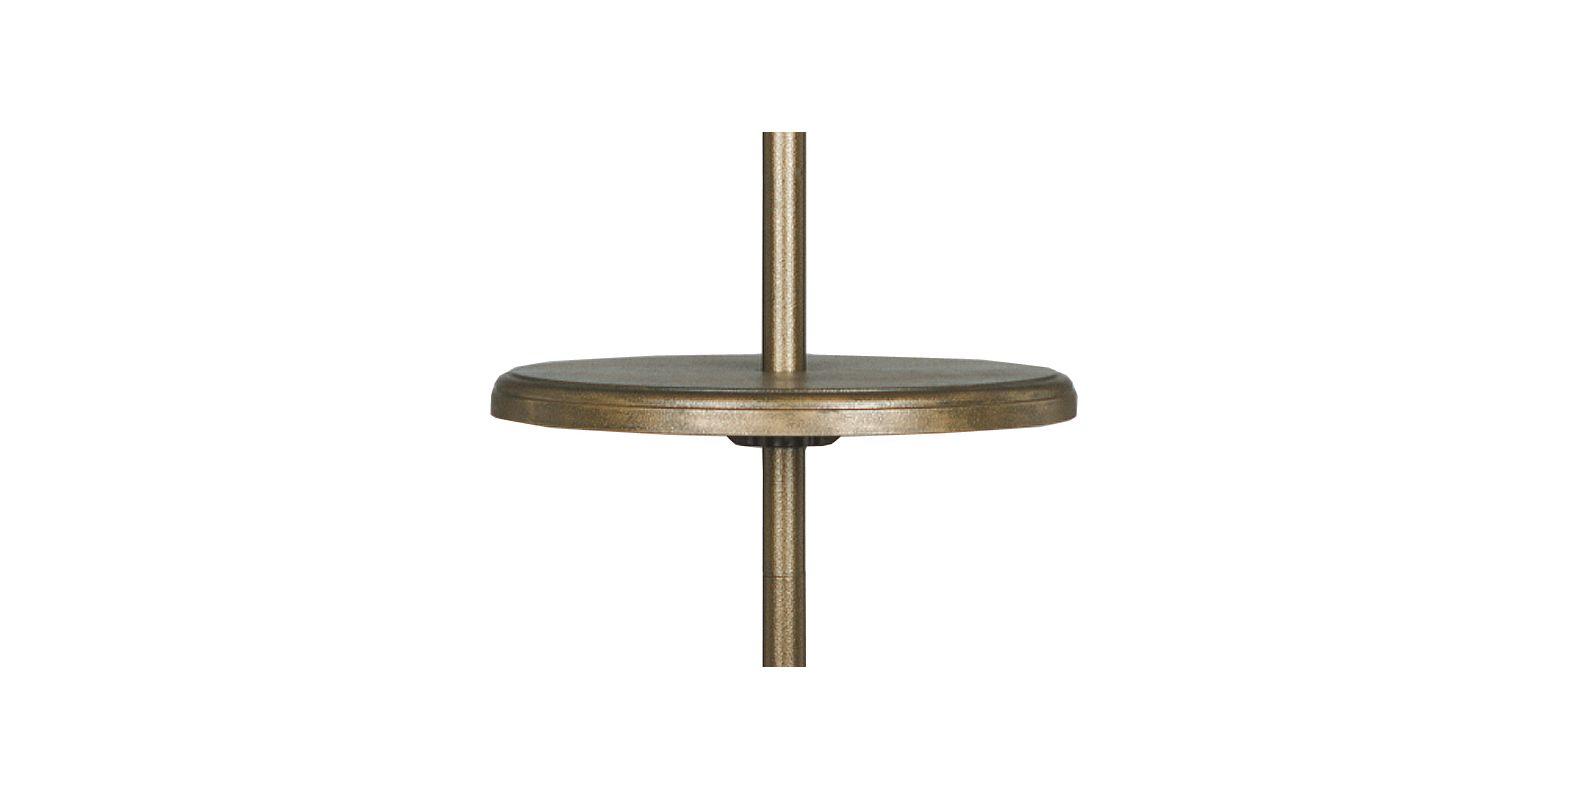 Fanimation TA92 Table Accessory for Torrento Post Fans Aged Bronze Sale $43.00 ITEM#: 197425 MODEL# :TA92AZ UPC#: 840506043893 :